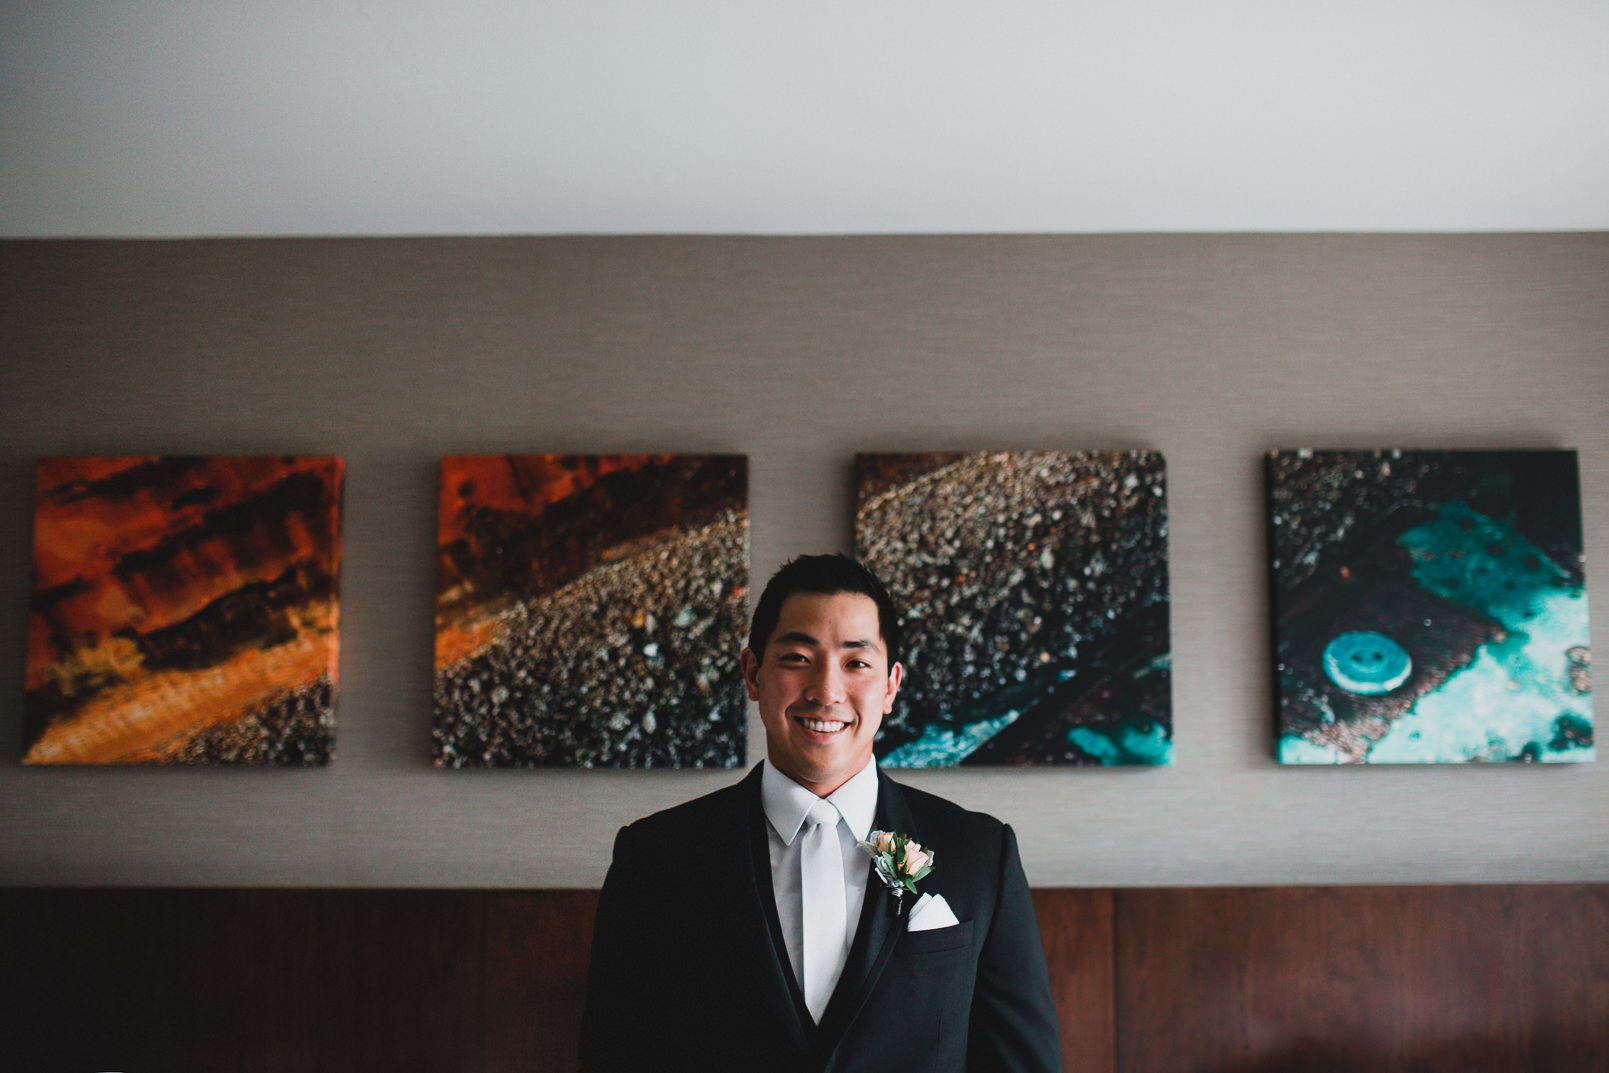 036-Jonathan-Kuhn-Photography-Wedding-_mini.jpg